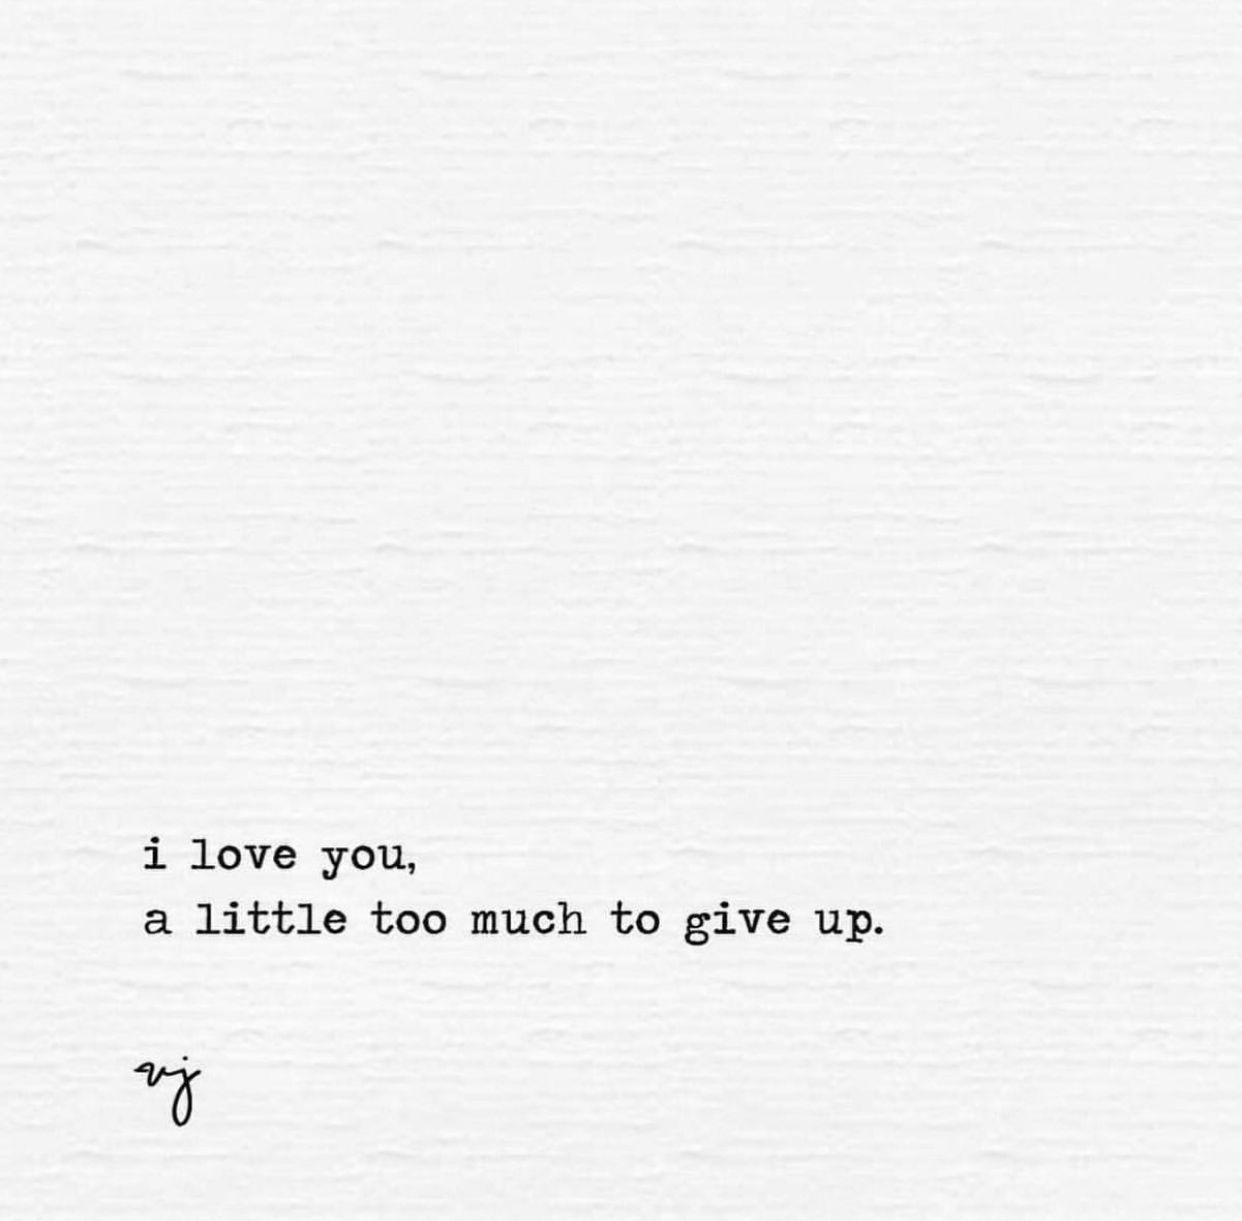 Pin Oleh Arshayna Di Quotes And All Kutipan Terbaik Kutipan Tentang Cinta Romantis